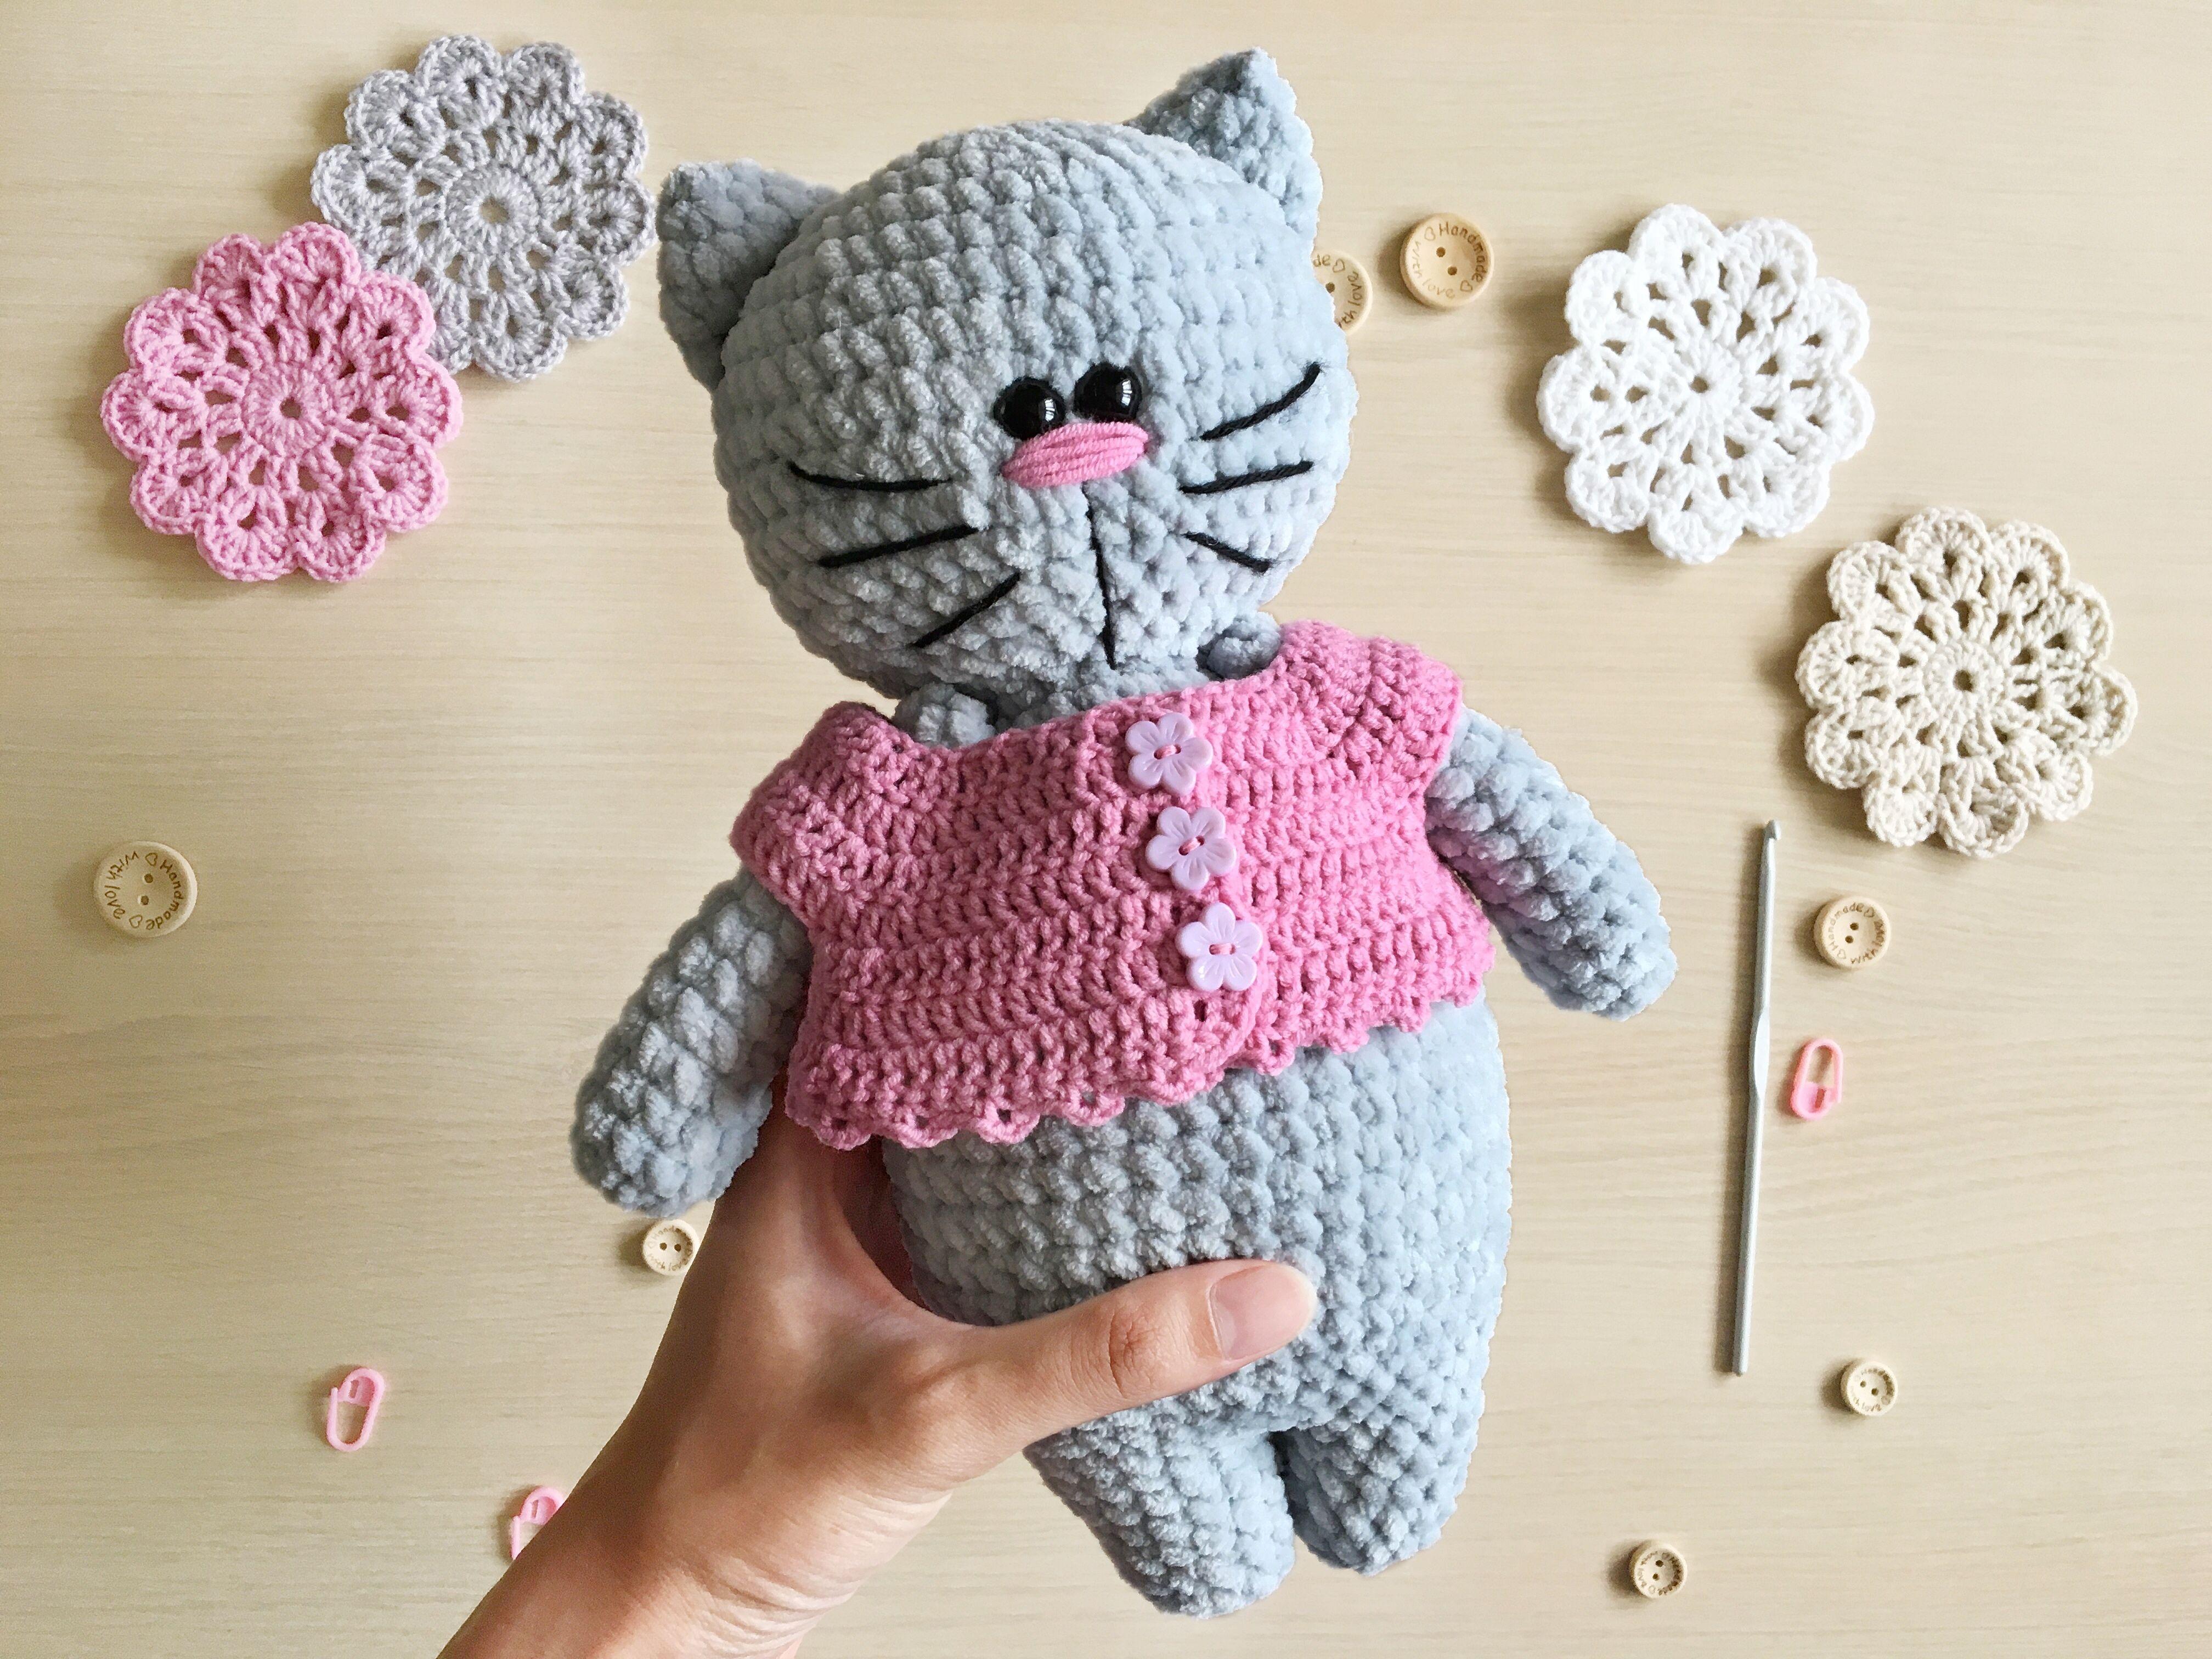 Crochet gray cat in a pink dress, Cute plush kitty toy